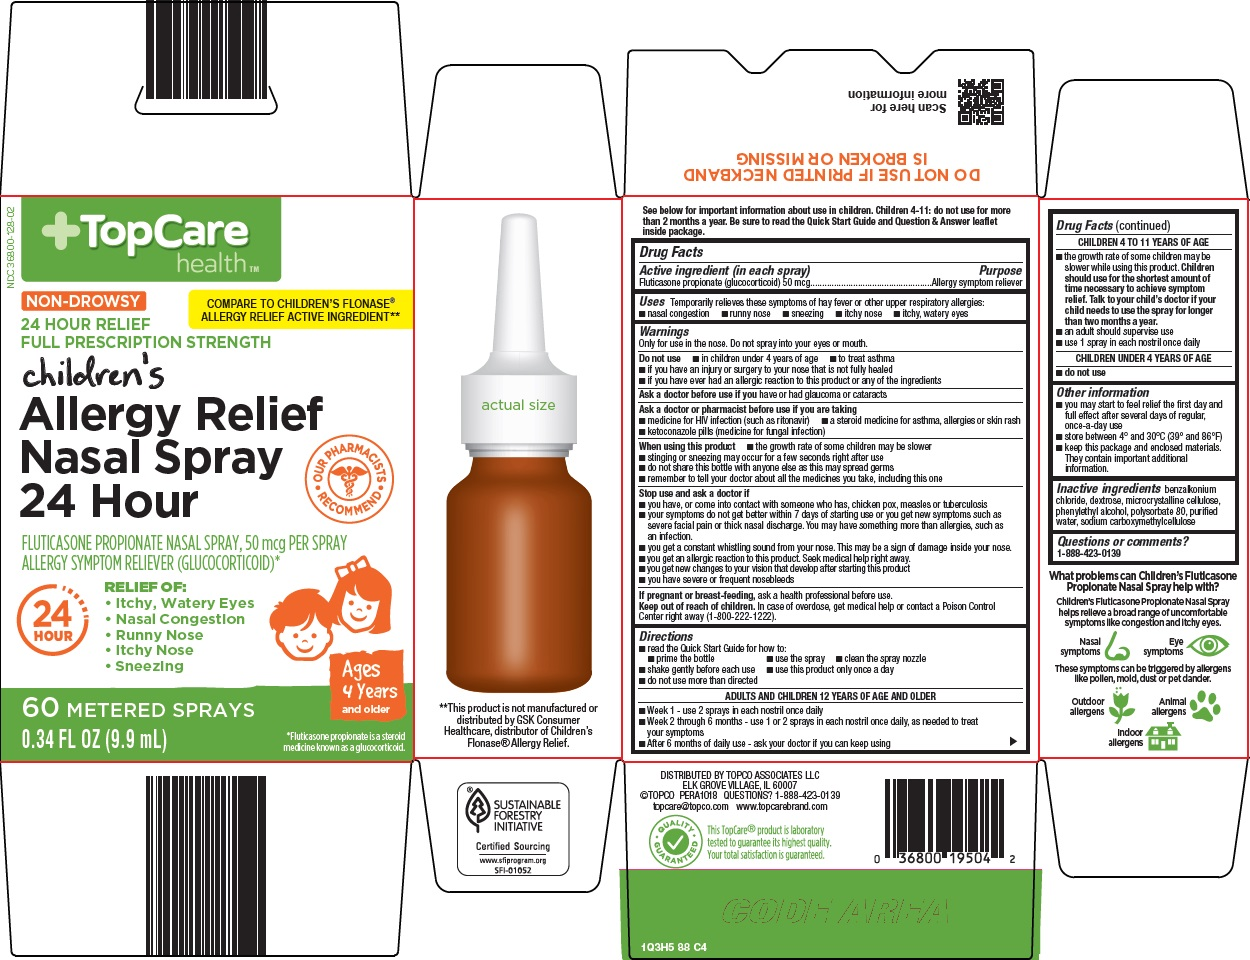 1q3-88-childrens-allergy-relief-nasal-spray-24-hour.jpg